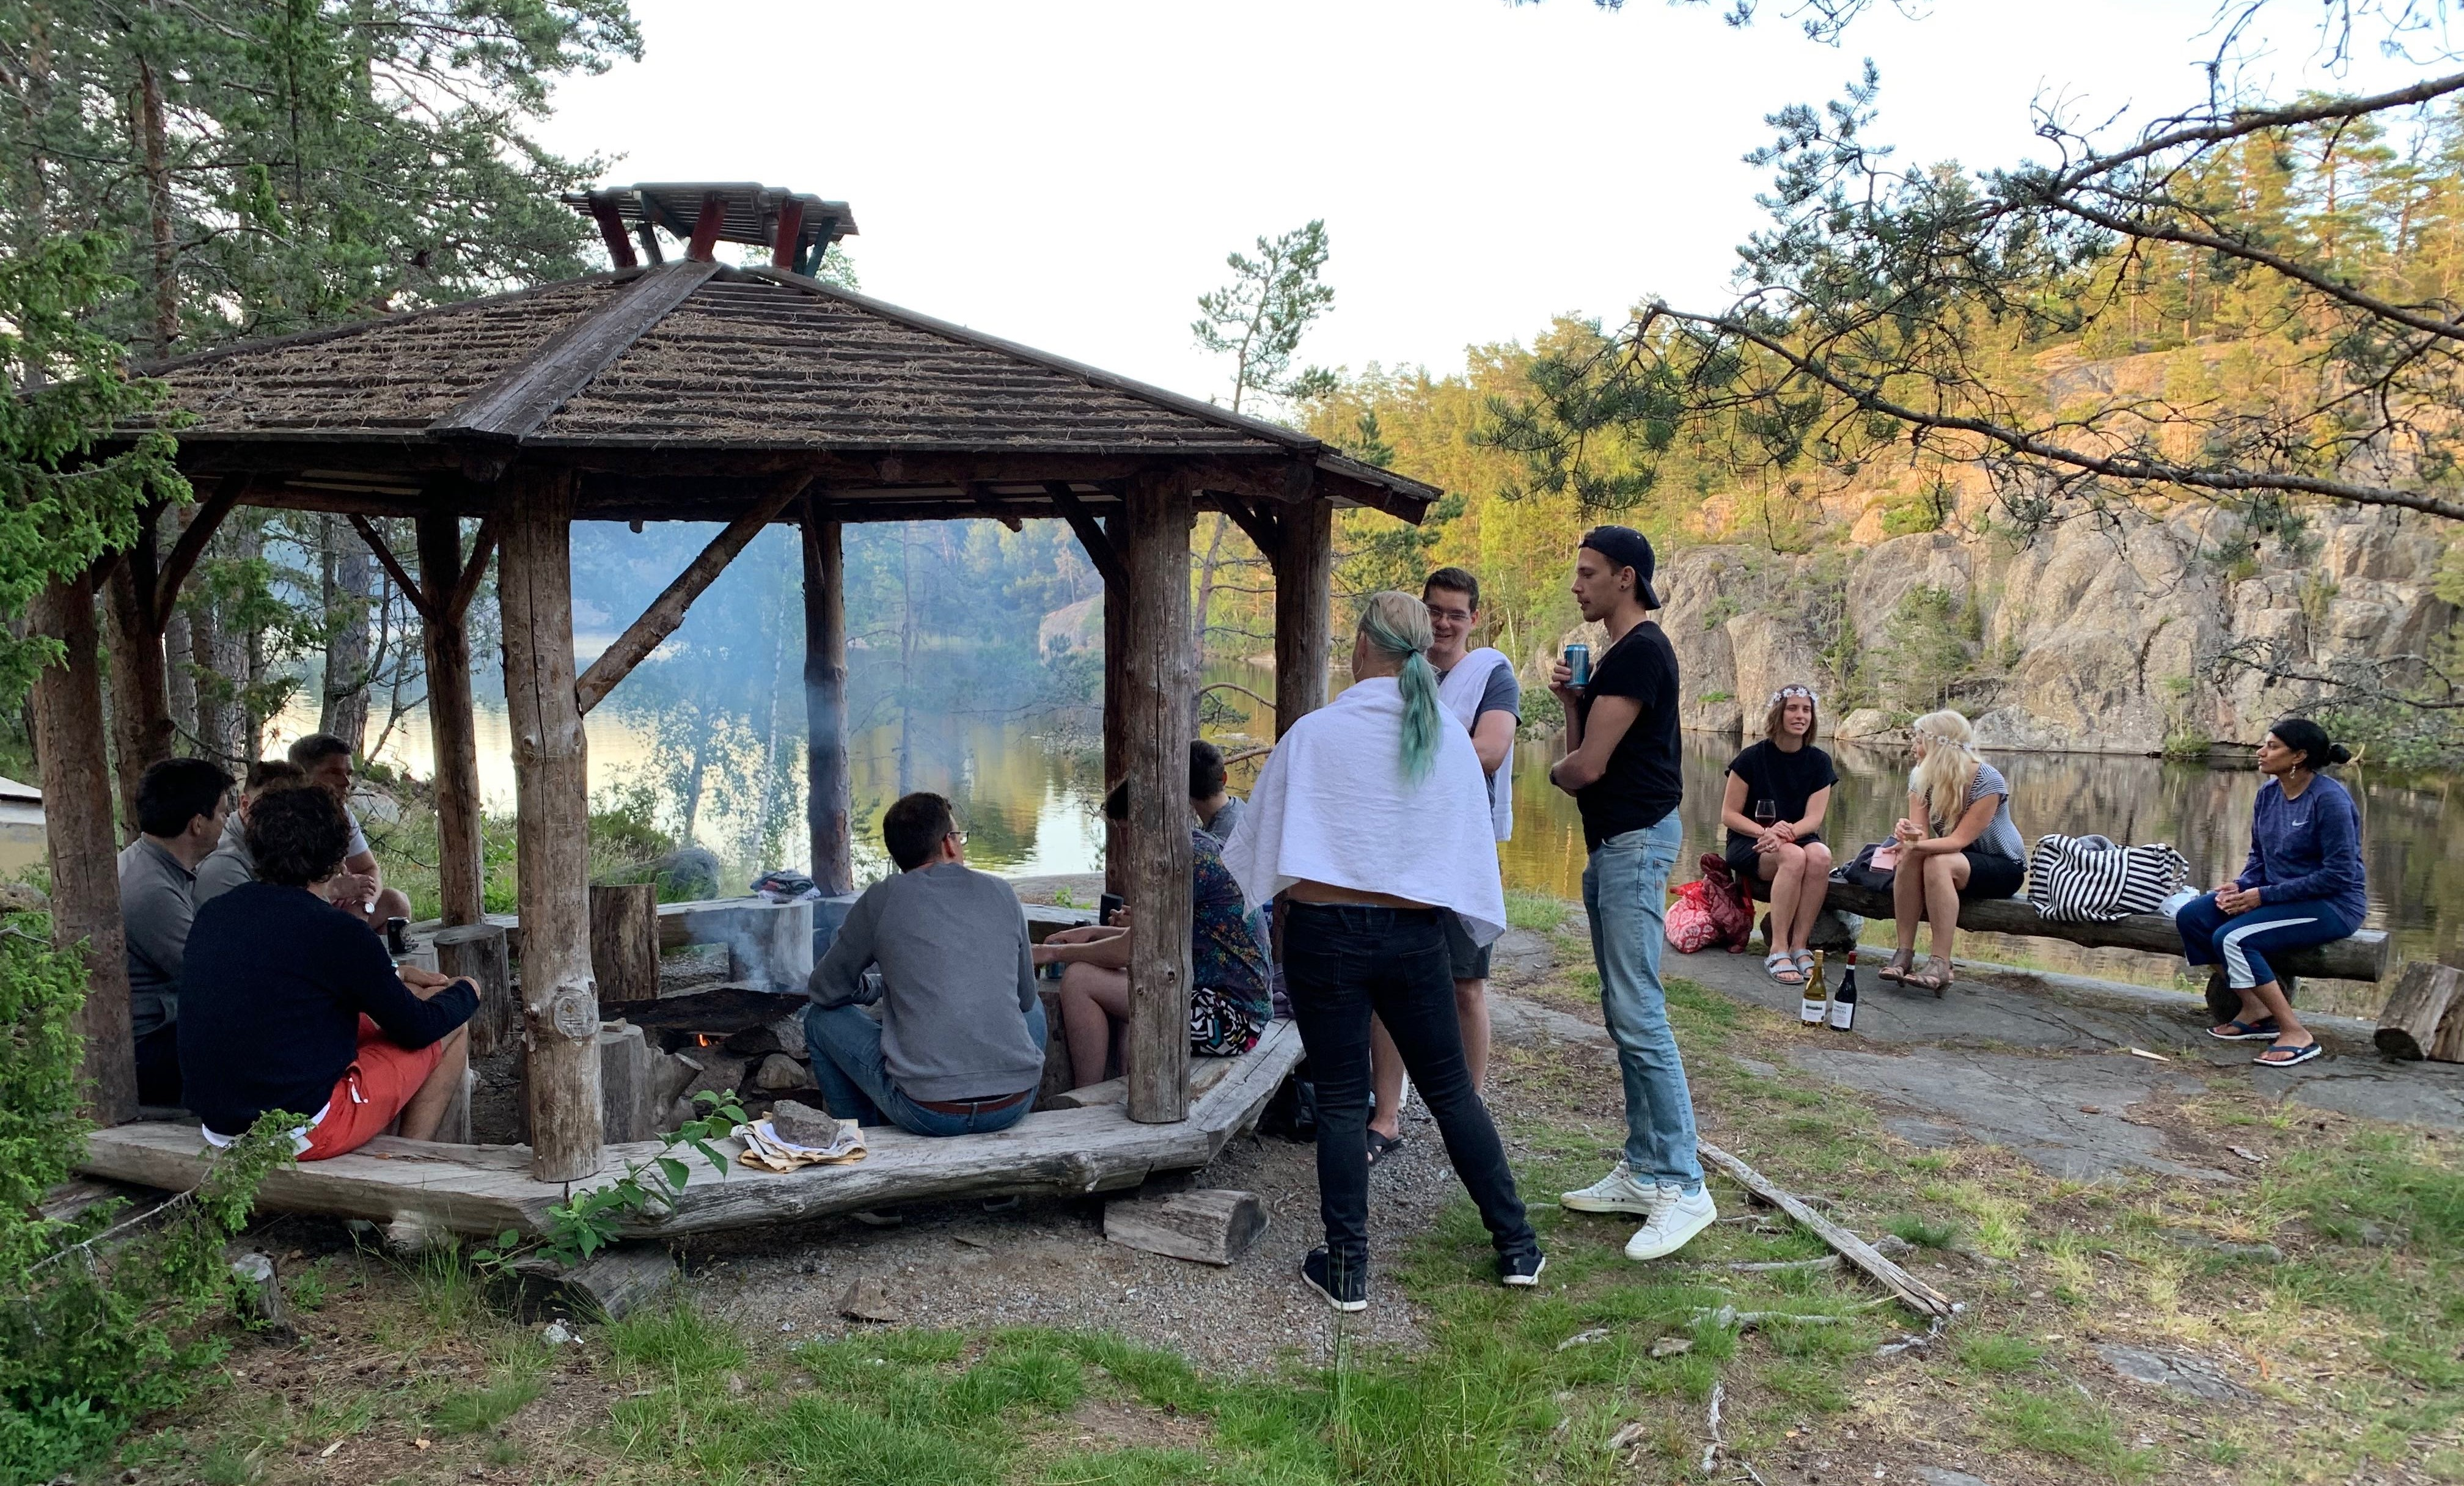 Around the campfire.